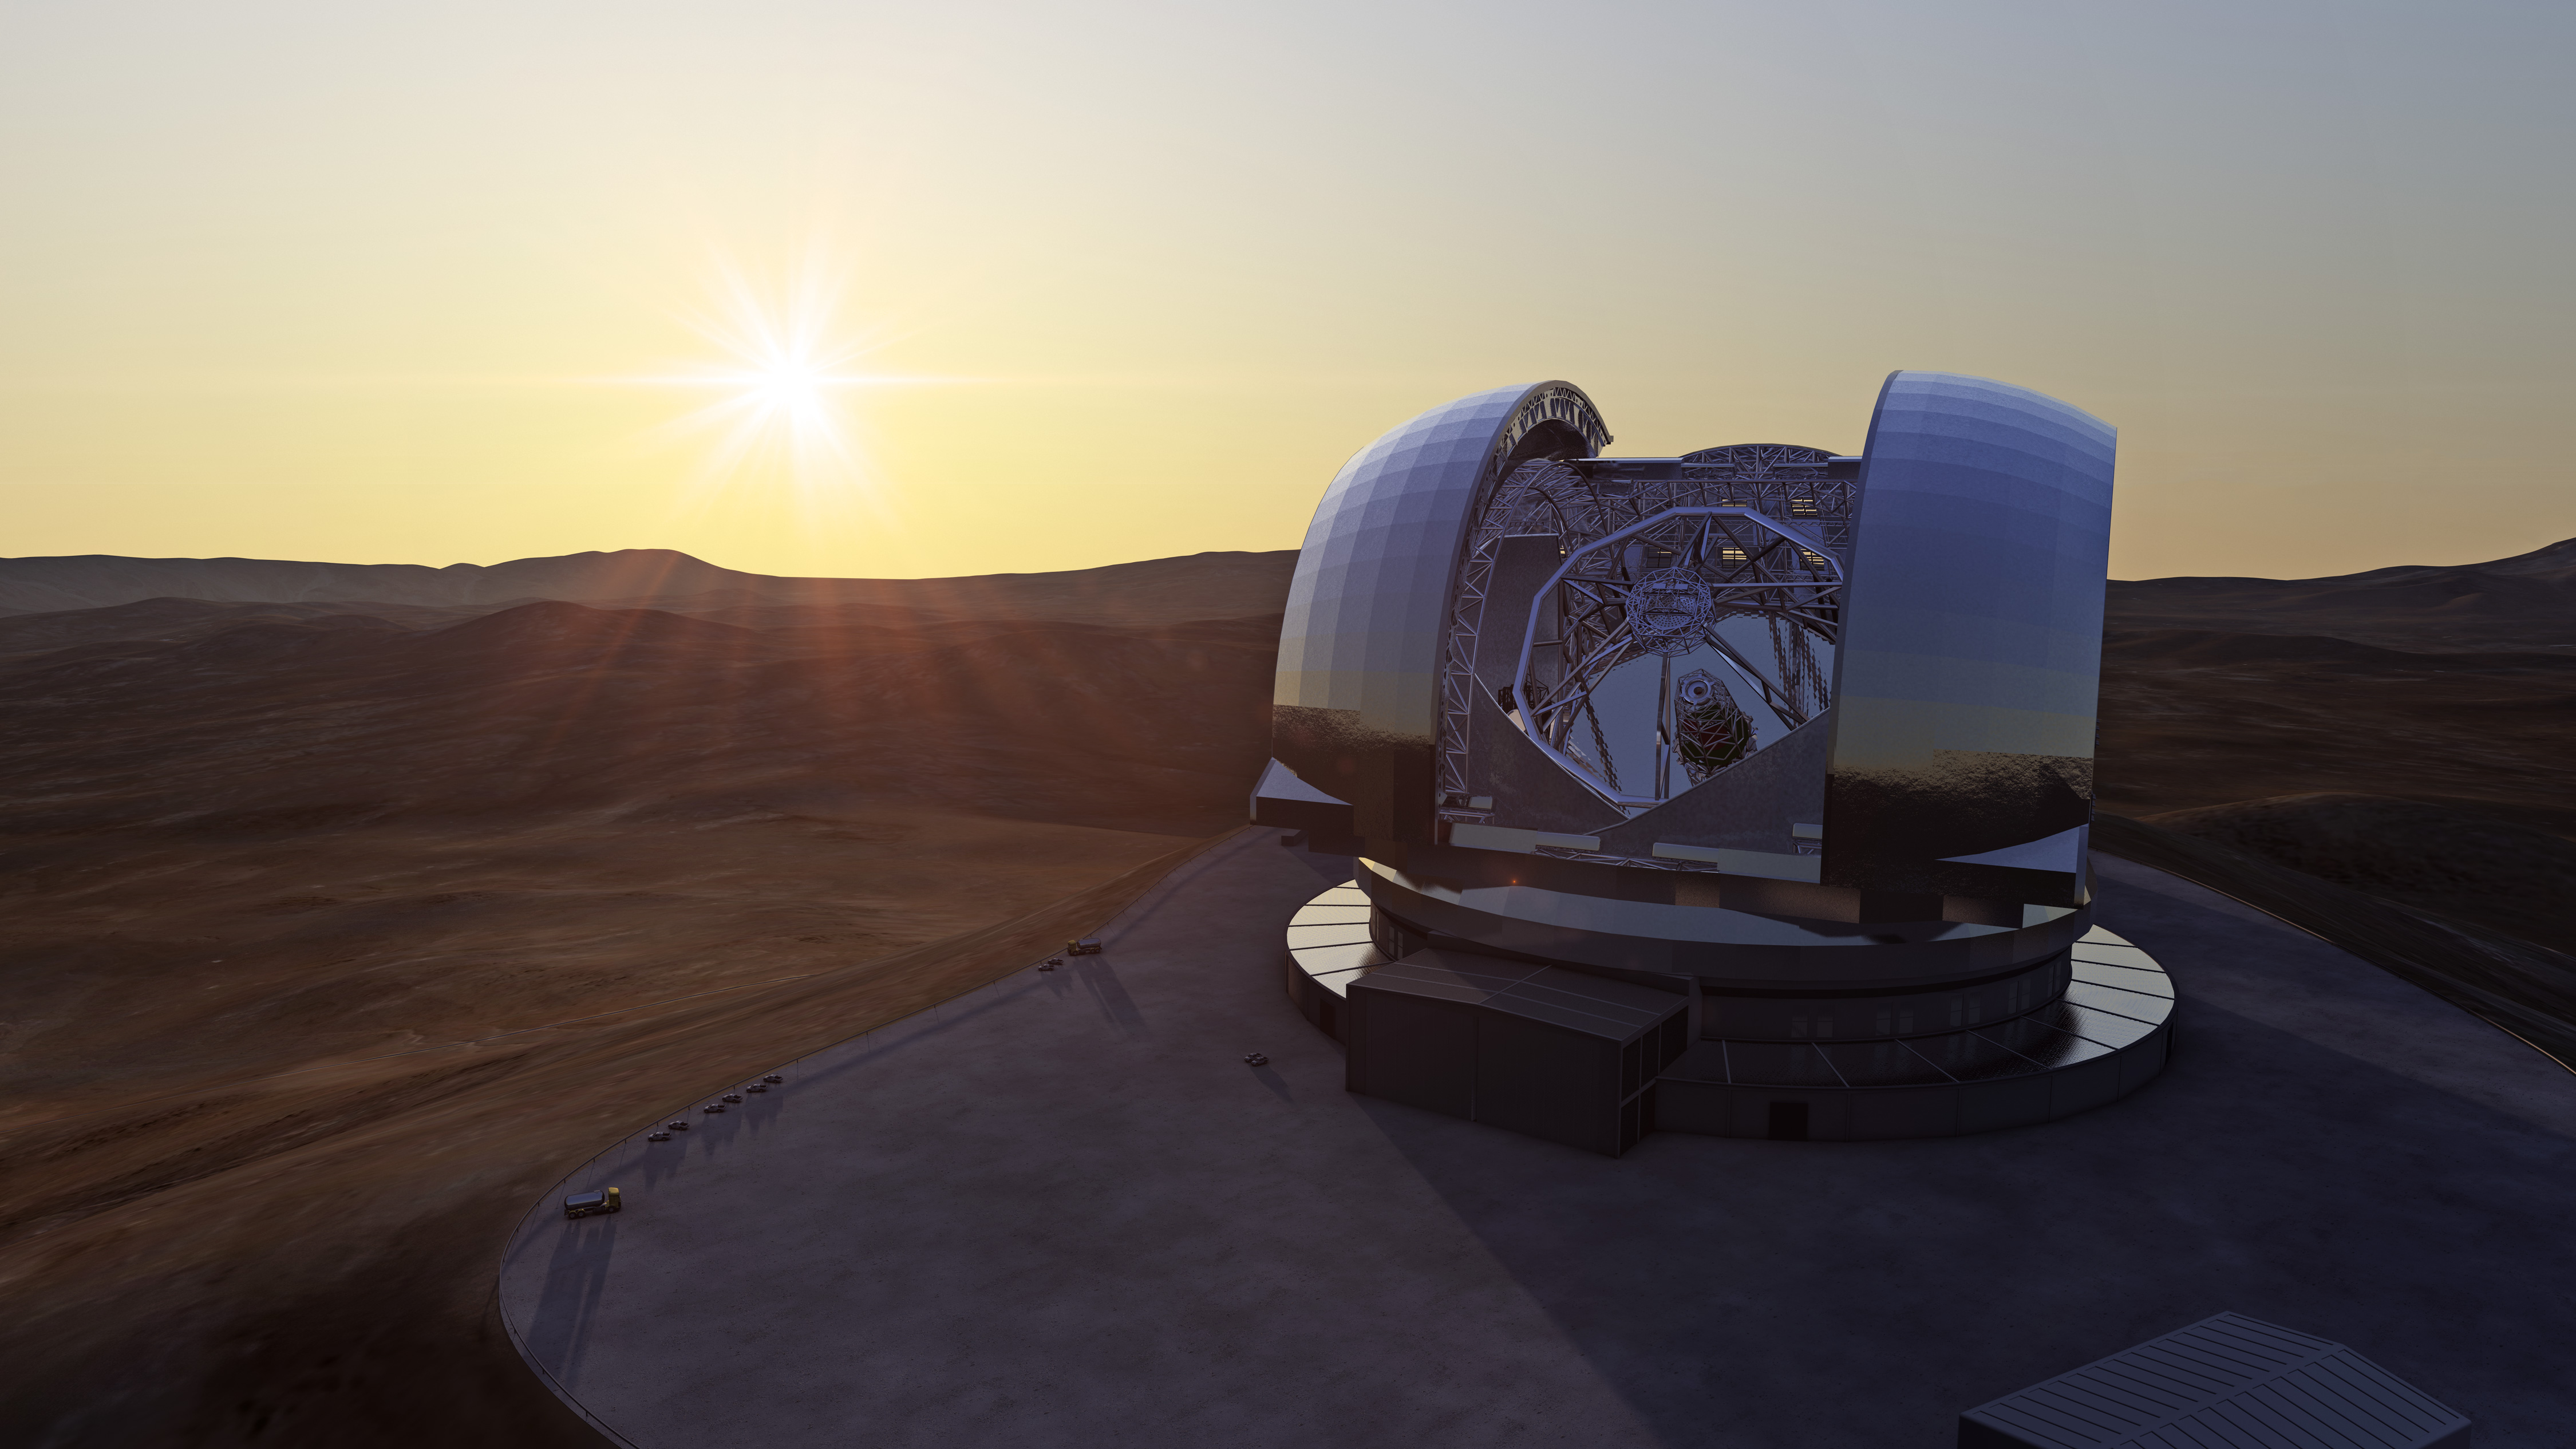 Ten Huge Telescopes on Earth